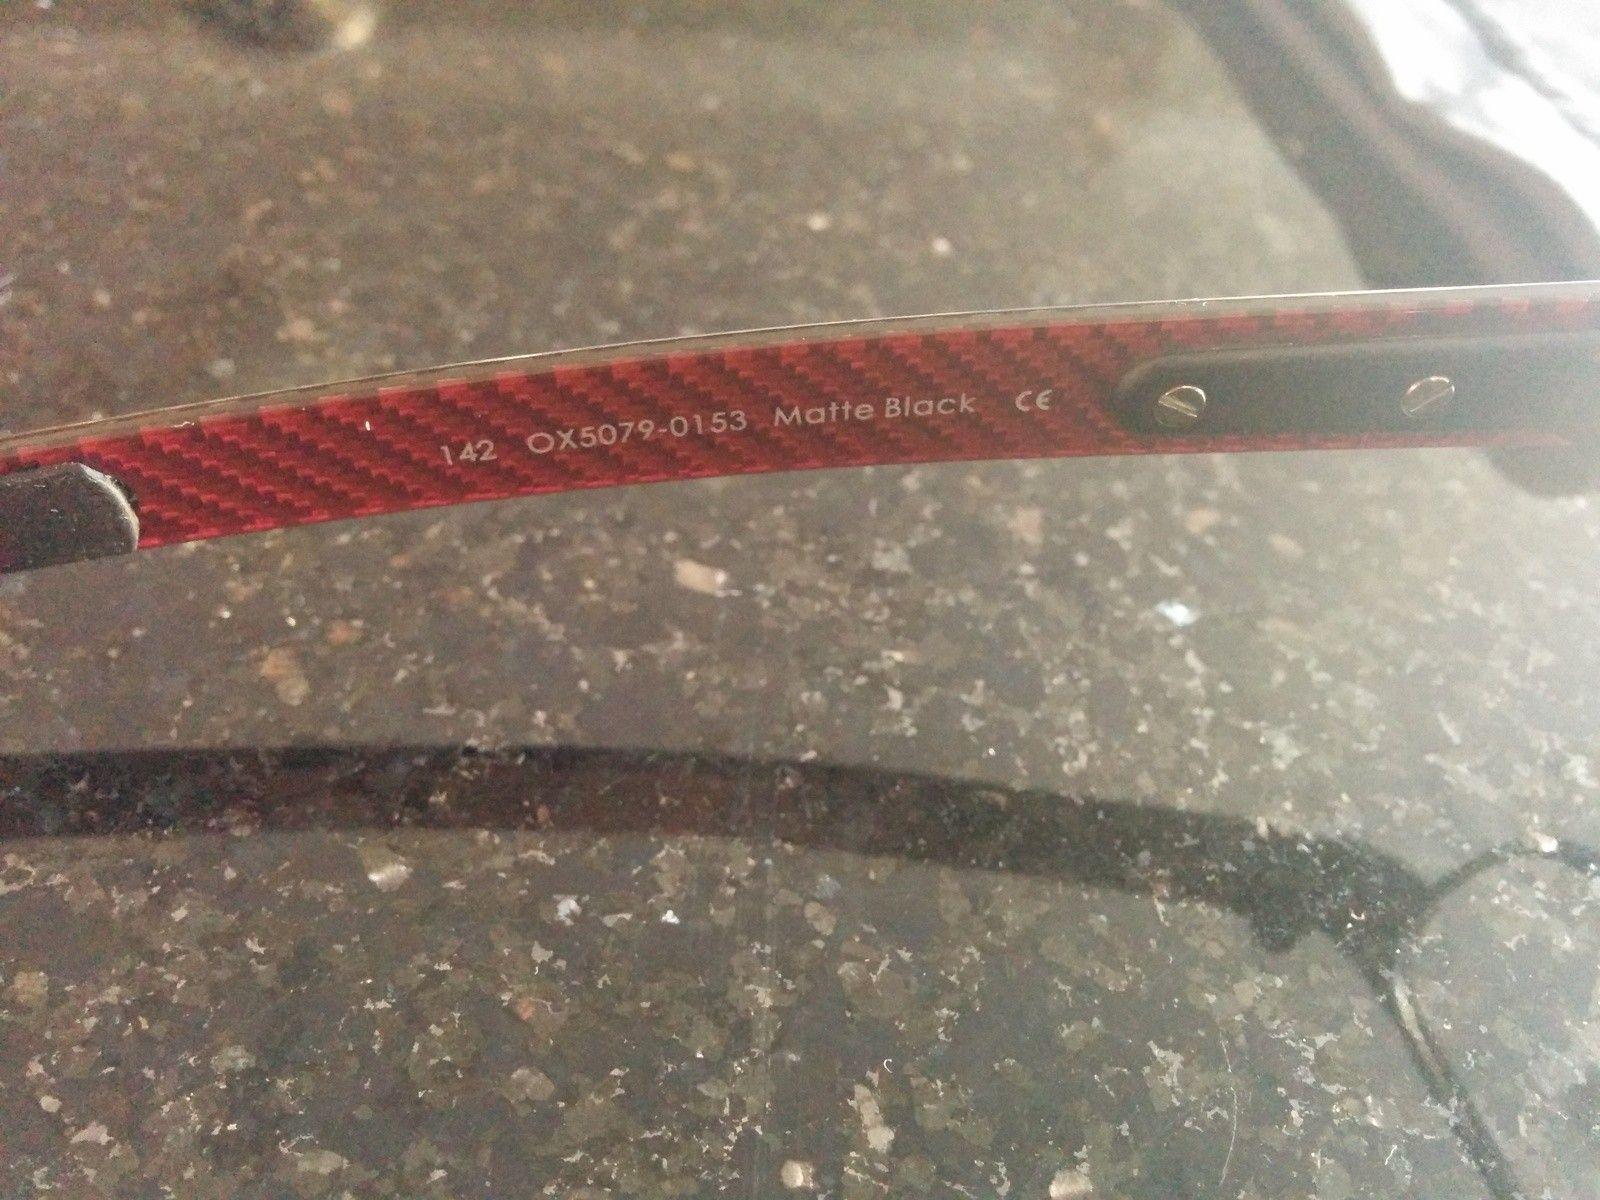 Oakley Carbon Plate Authenticity - uploadfromtaptalk1422031729817.jpg